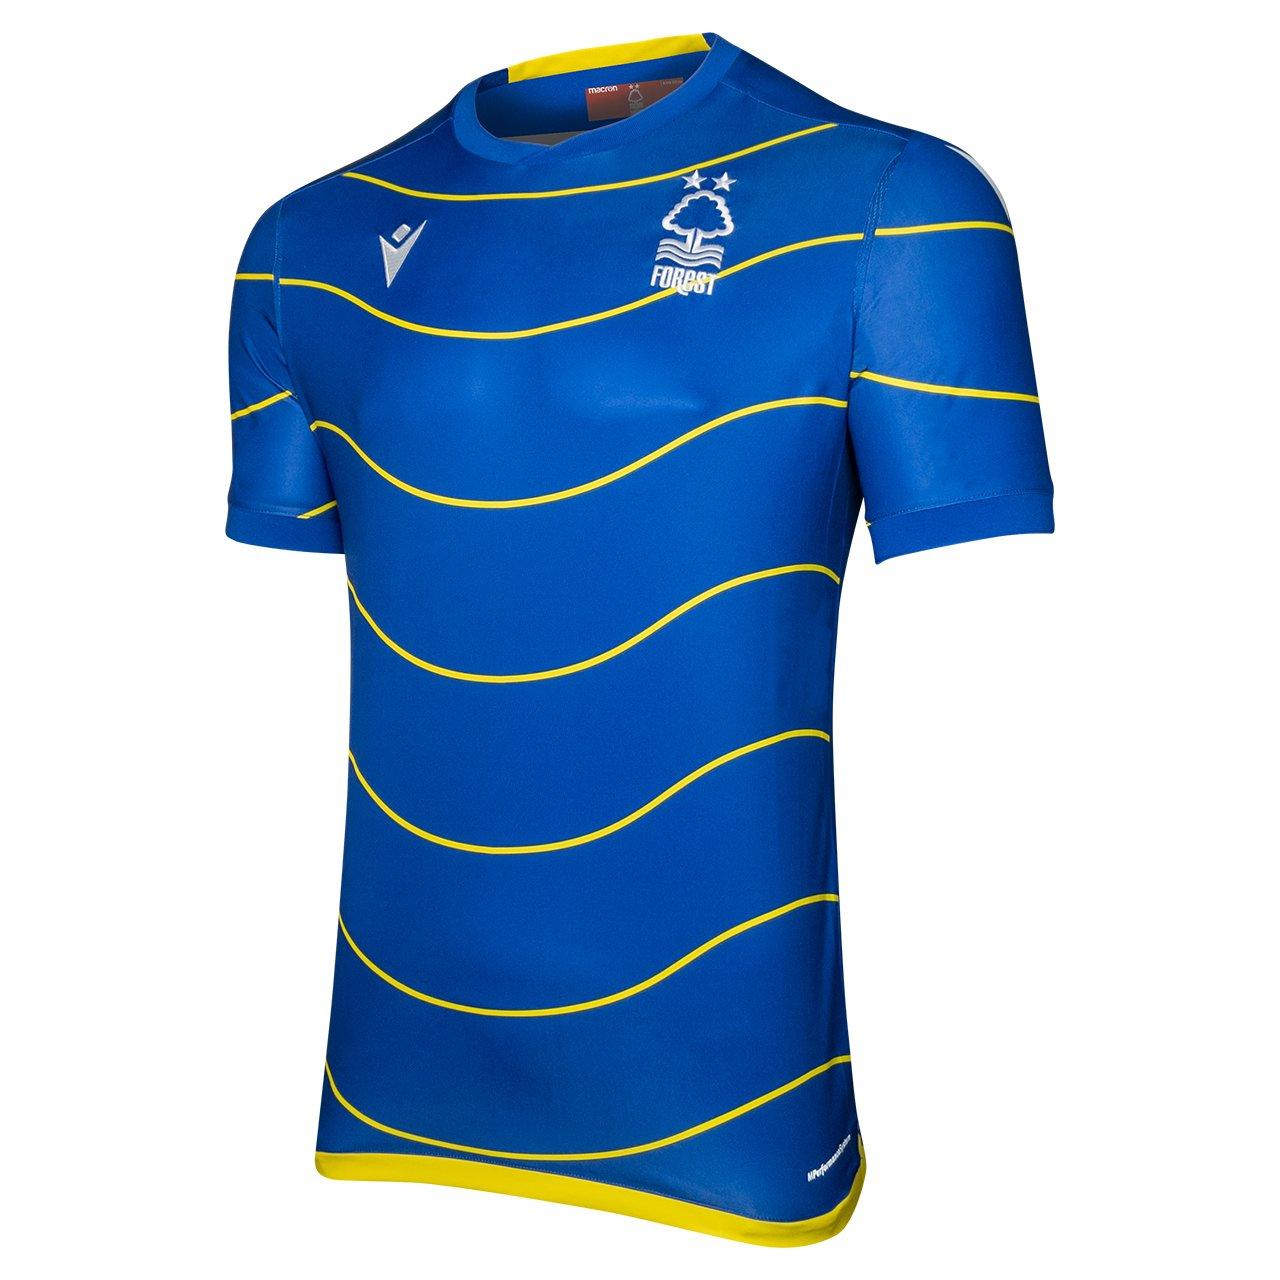 Nottingham Forest Junior Football Shirt 2020/21 - £15 each delivered @ Nottm Forest club shop